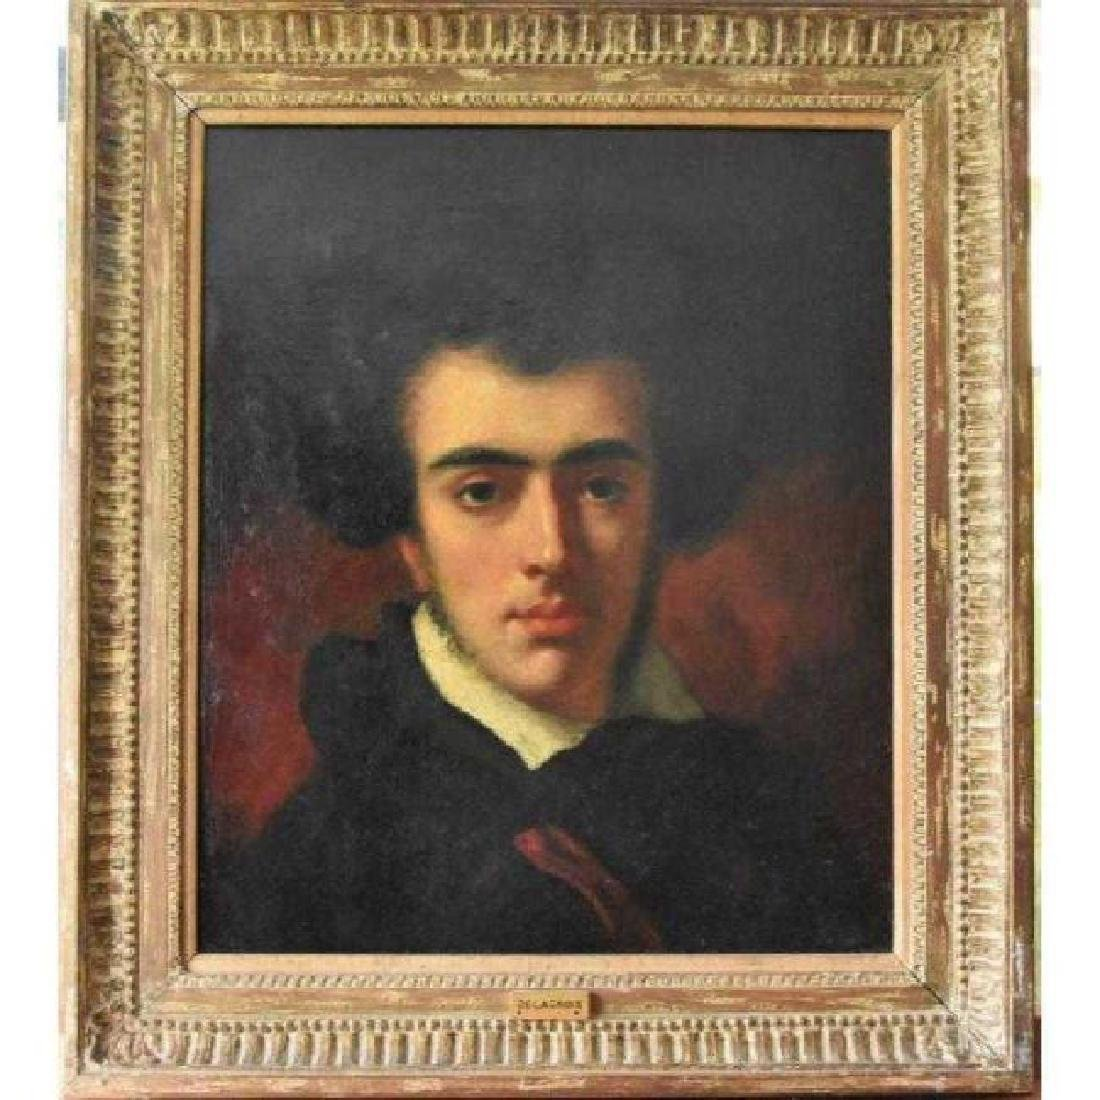 Eugene Delacroix (1798-1863) Oil On Canvas